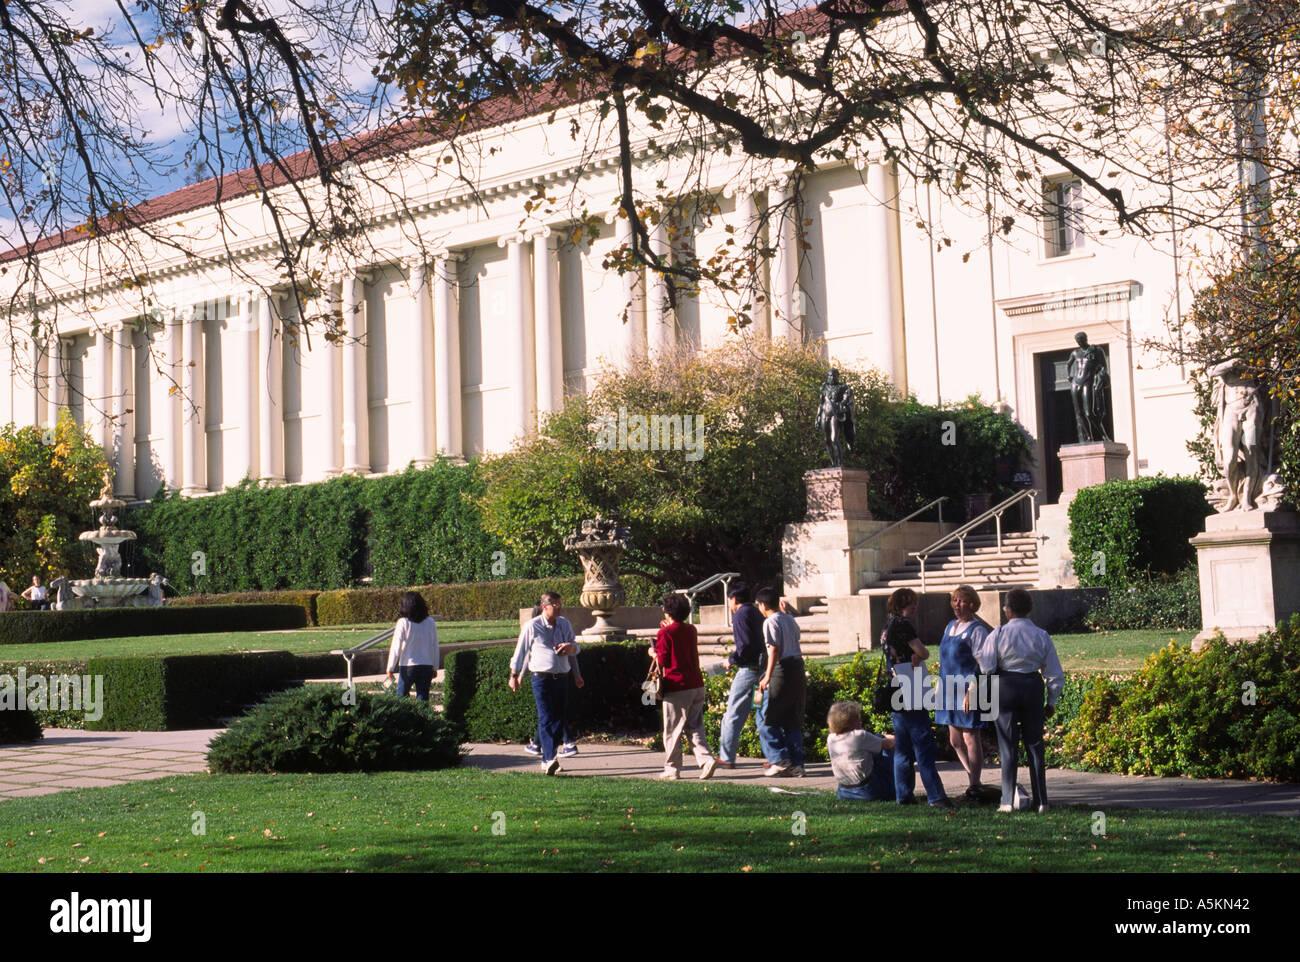 The Huntington Library Botanical Gardens San Marino California Usa Stock Photo Royalty Free